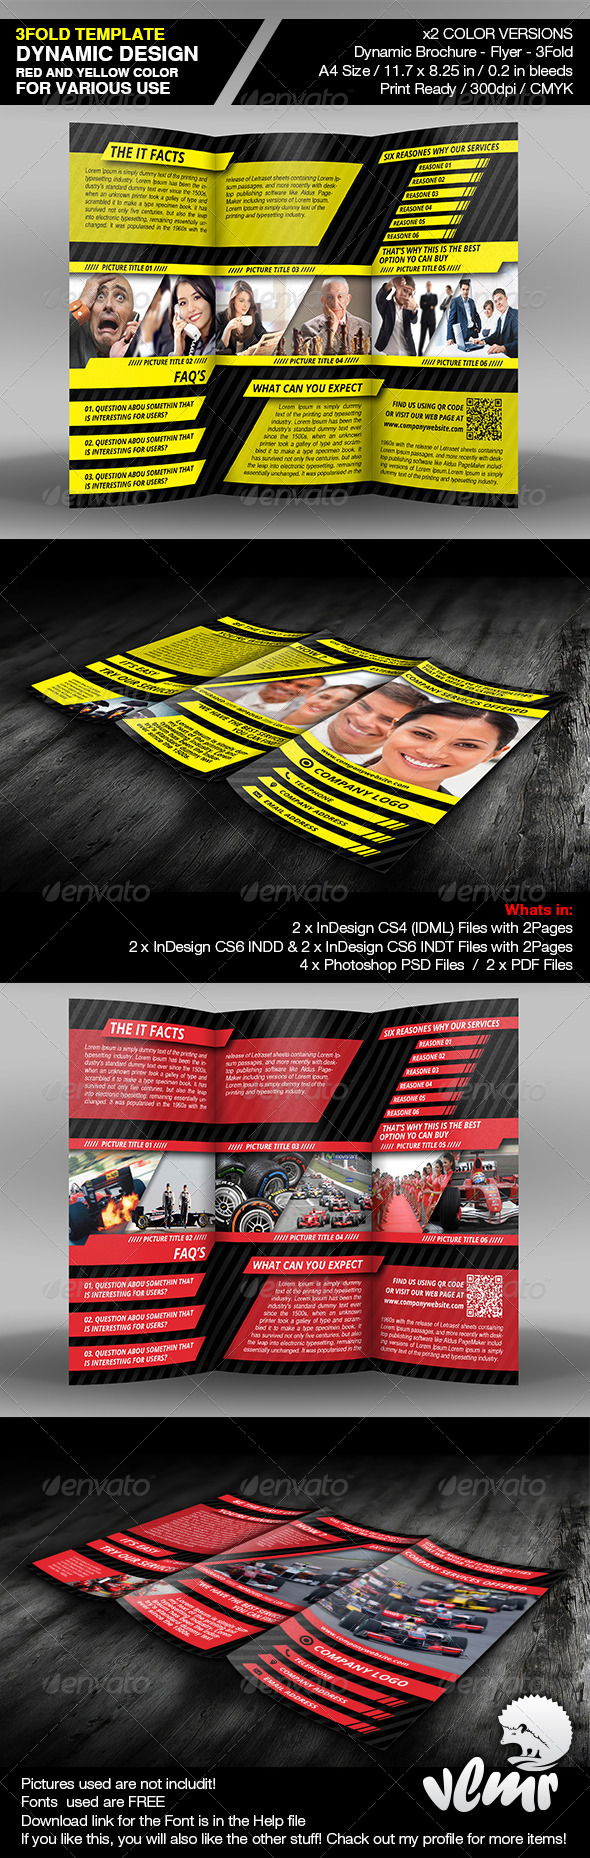 Dynamic Brochure 3Fold Template - Corporate Brochures